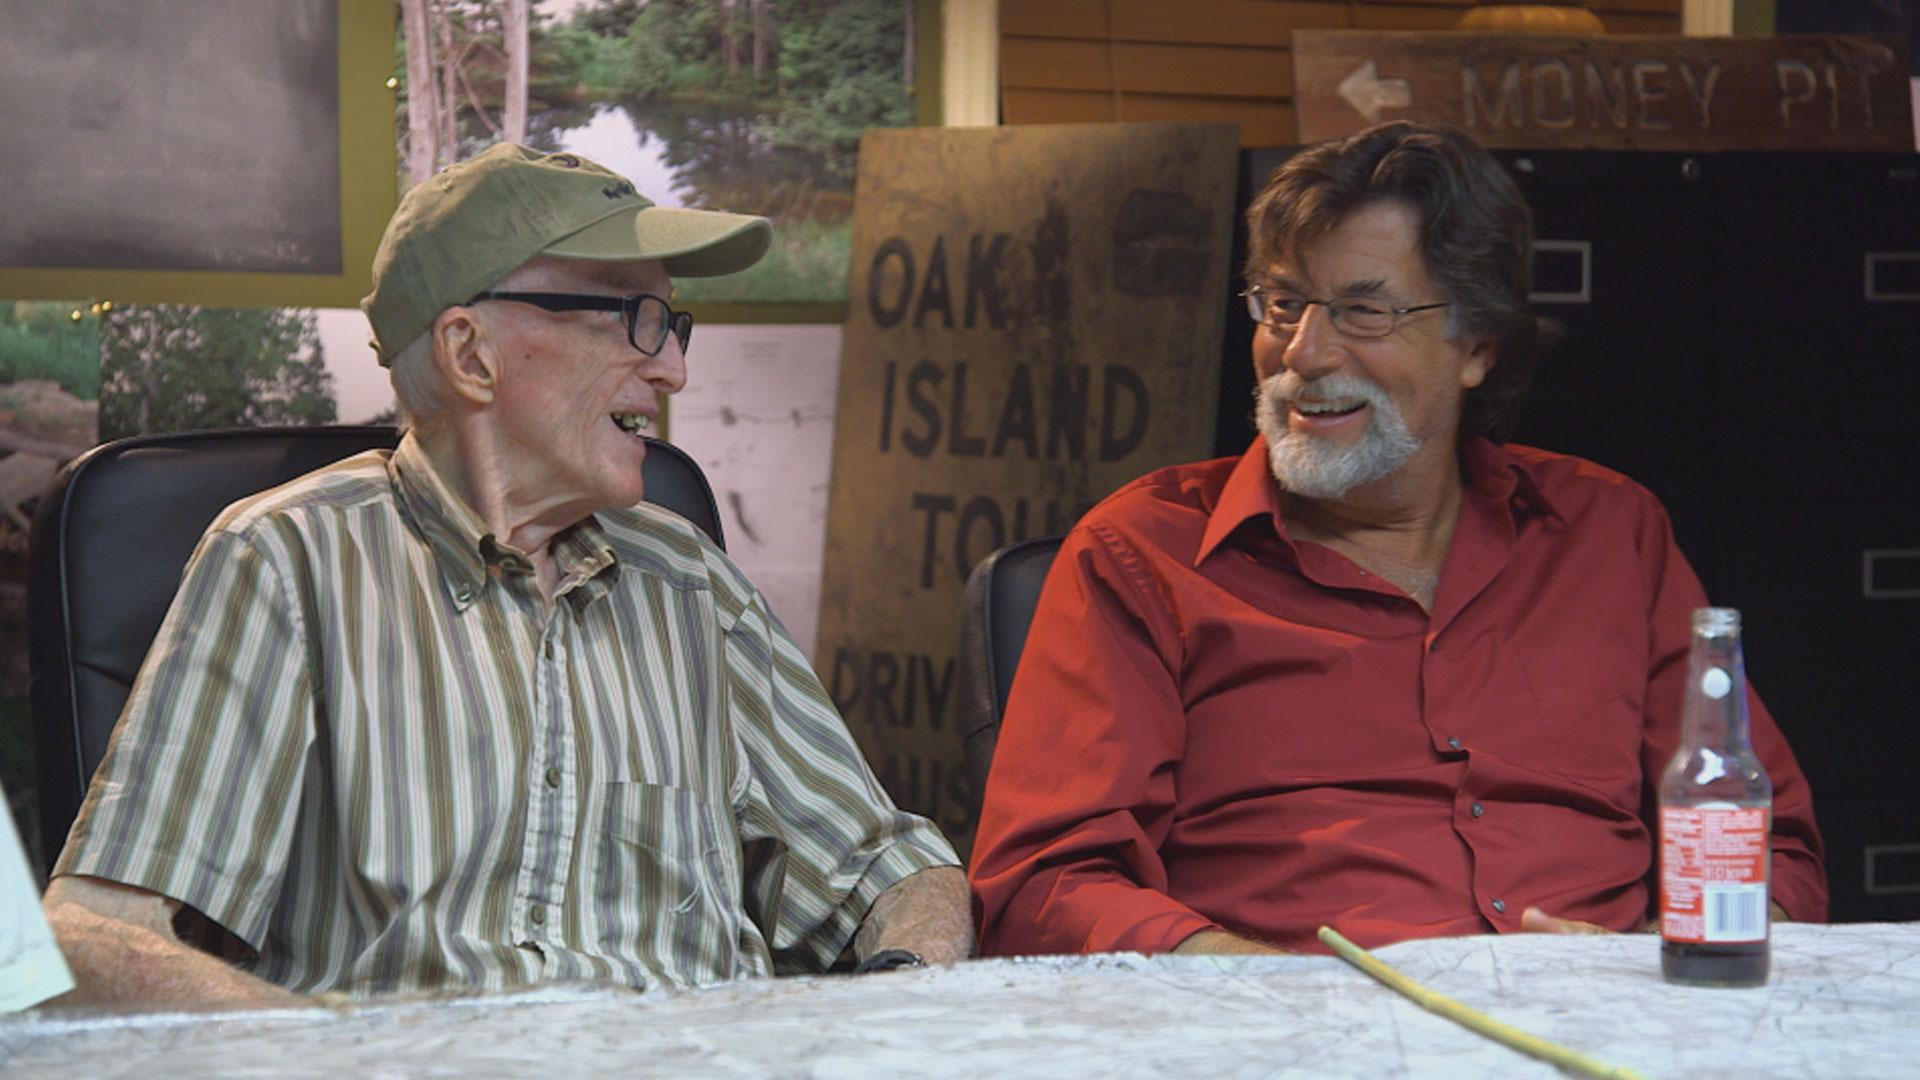 The Curse of Oak Island: The Missing Peace